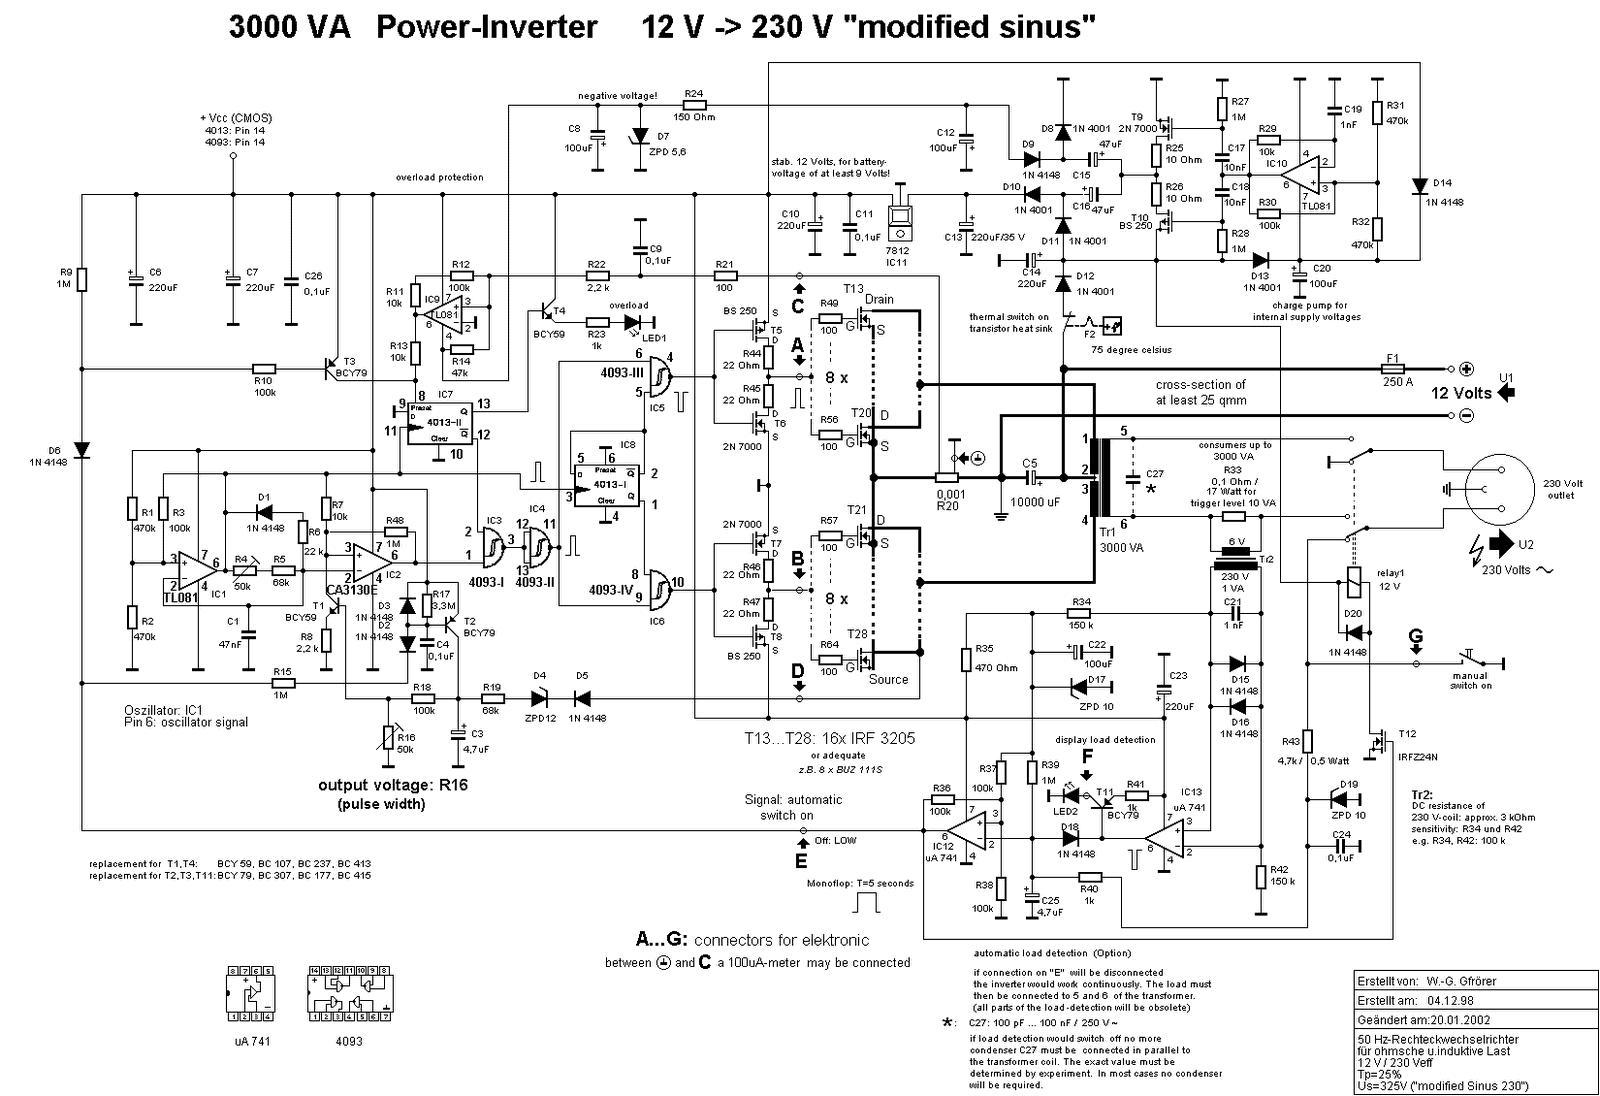 Cat Th63 Wiring Schematic 1997 - Wiring Diagram